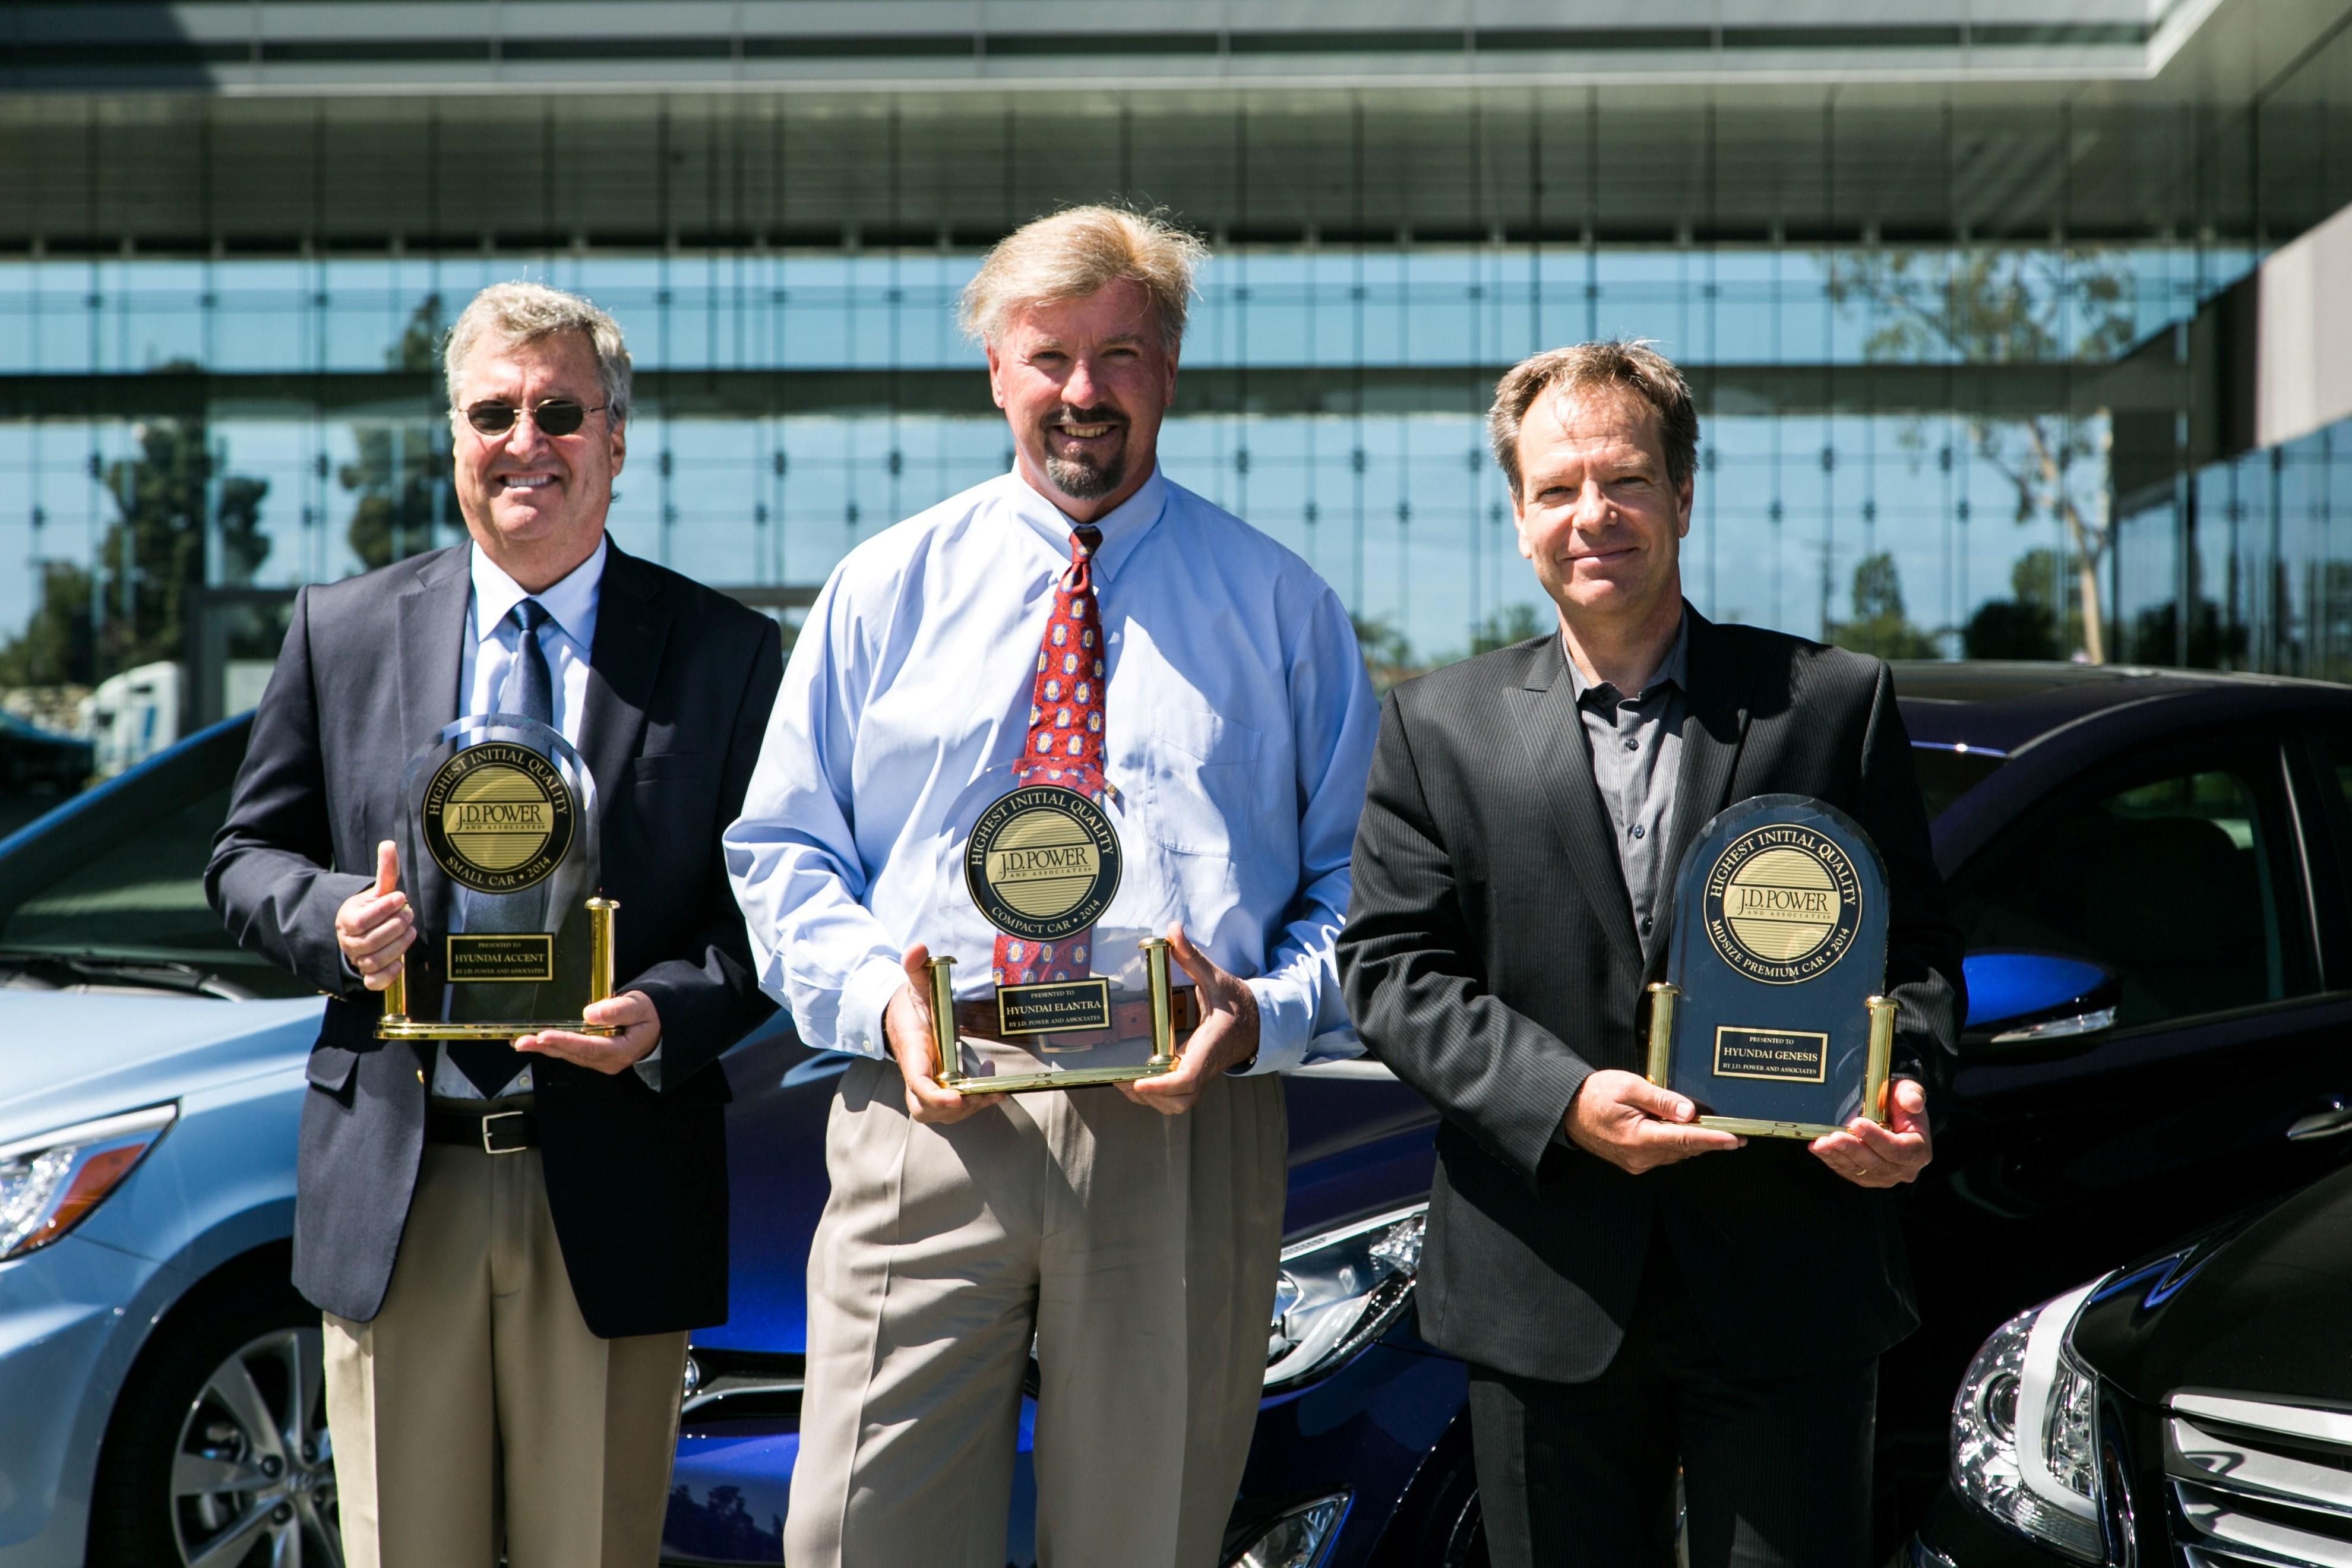 Jerry Auto Sales >> Hyundai Motor America Fires Dave Zuchowski, Jerry Flannery Named Interim CEO - autoevolution